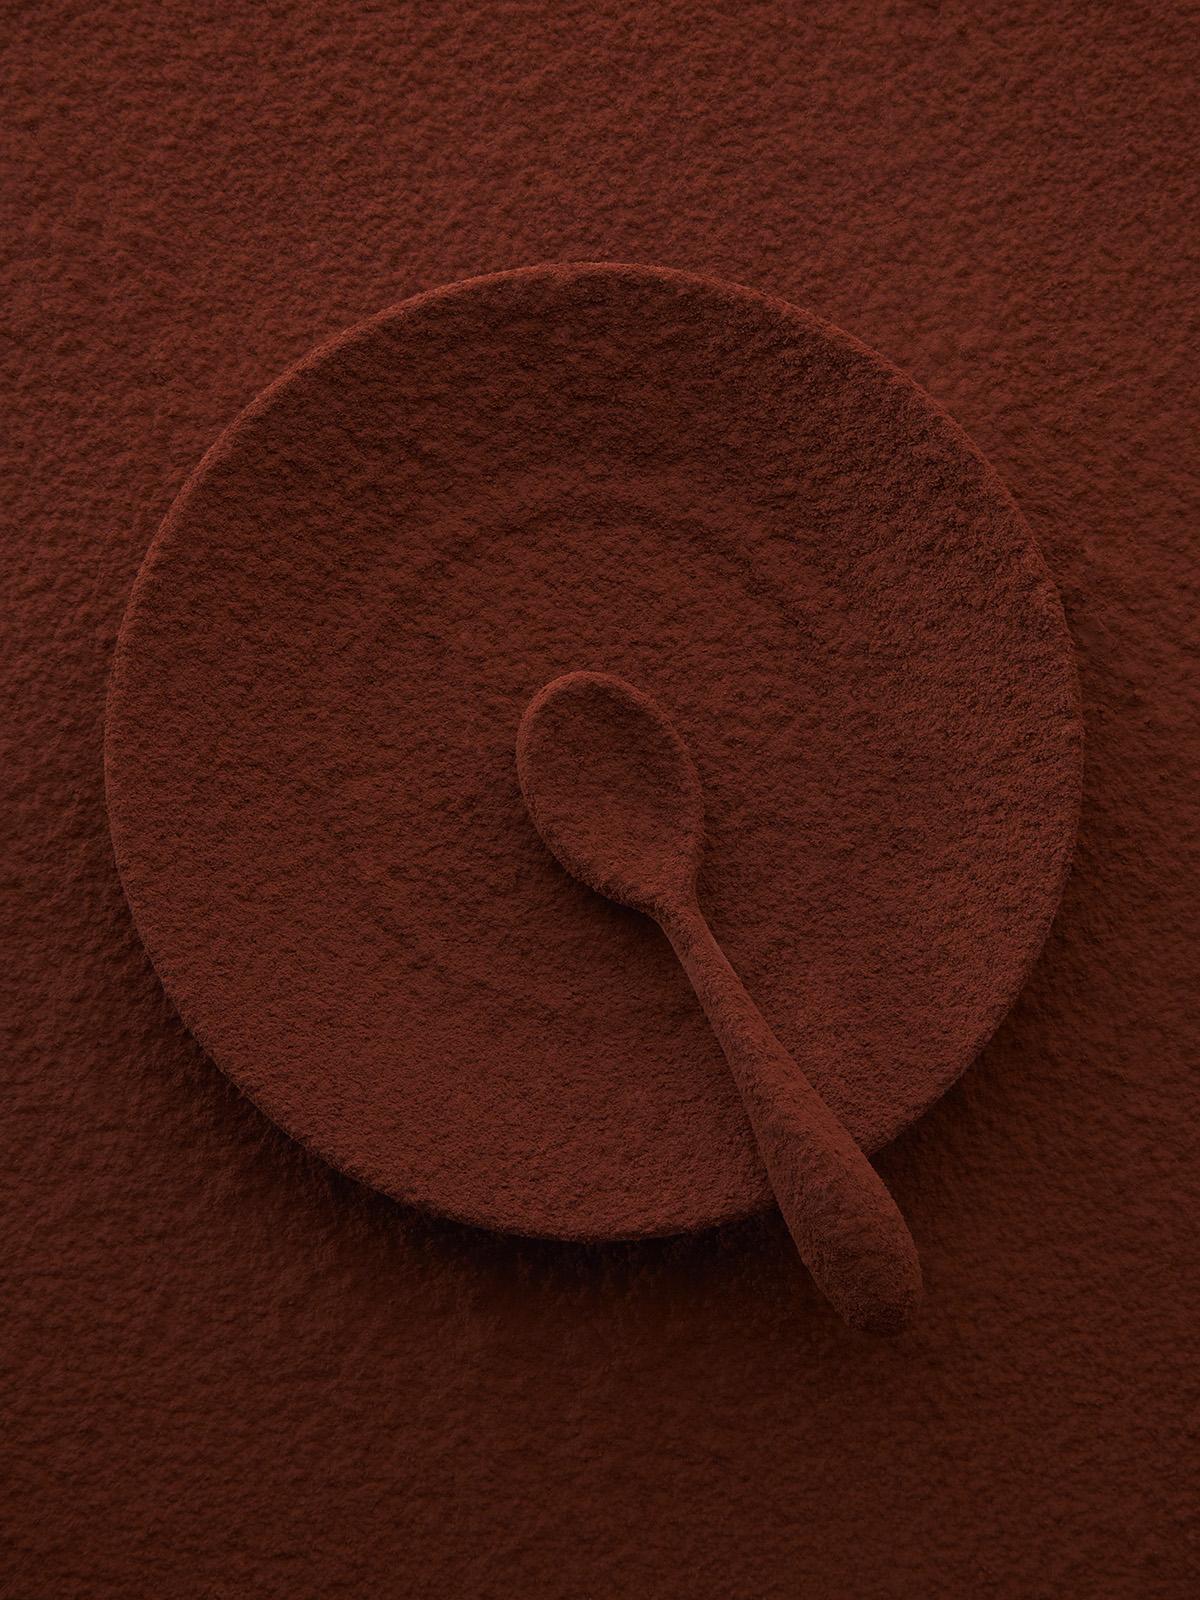 CecileetGuillaume-onfaitdesimages-photographeculinaire-photographealcool-valerie-paumelle-agent (16).jpg